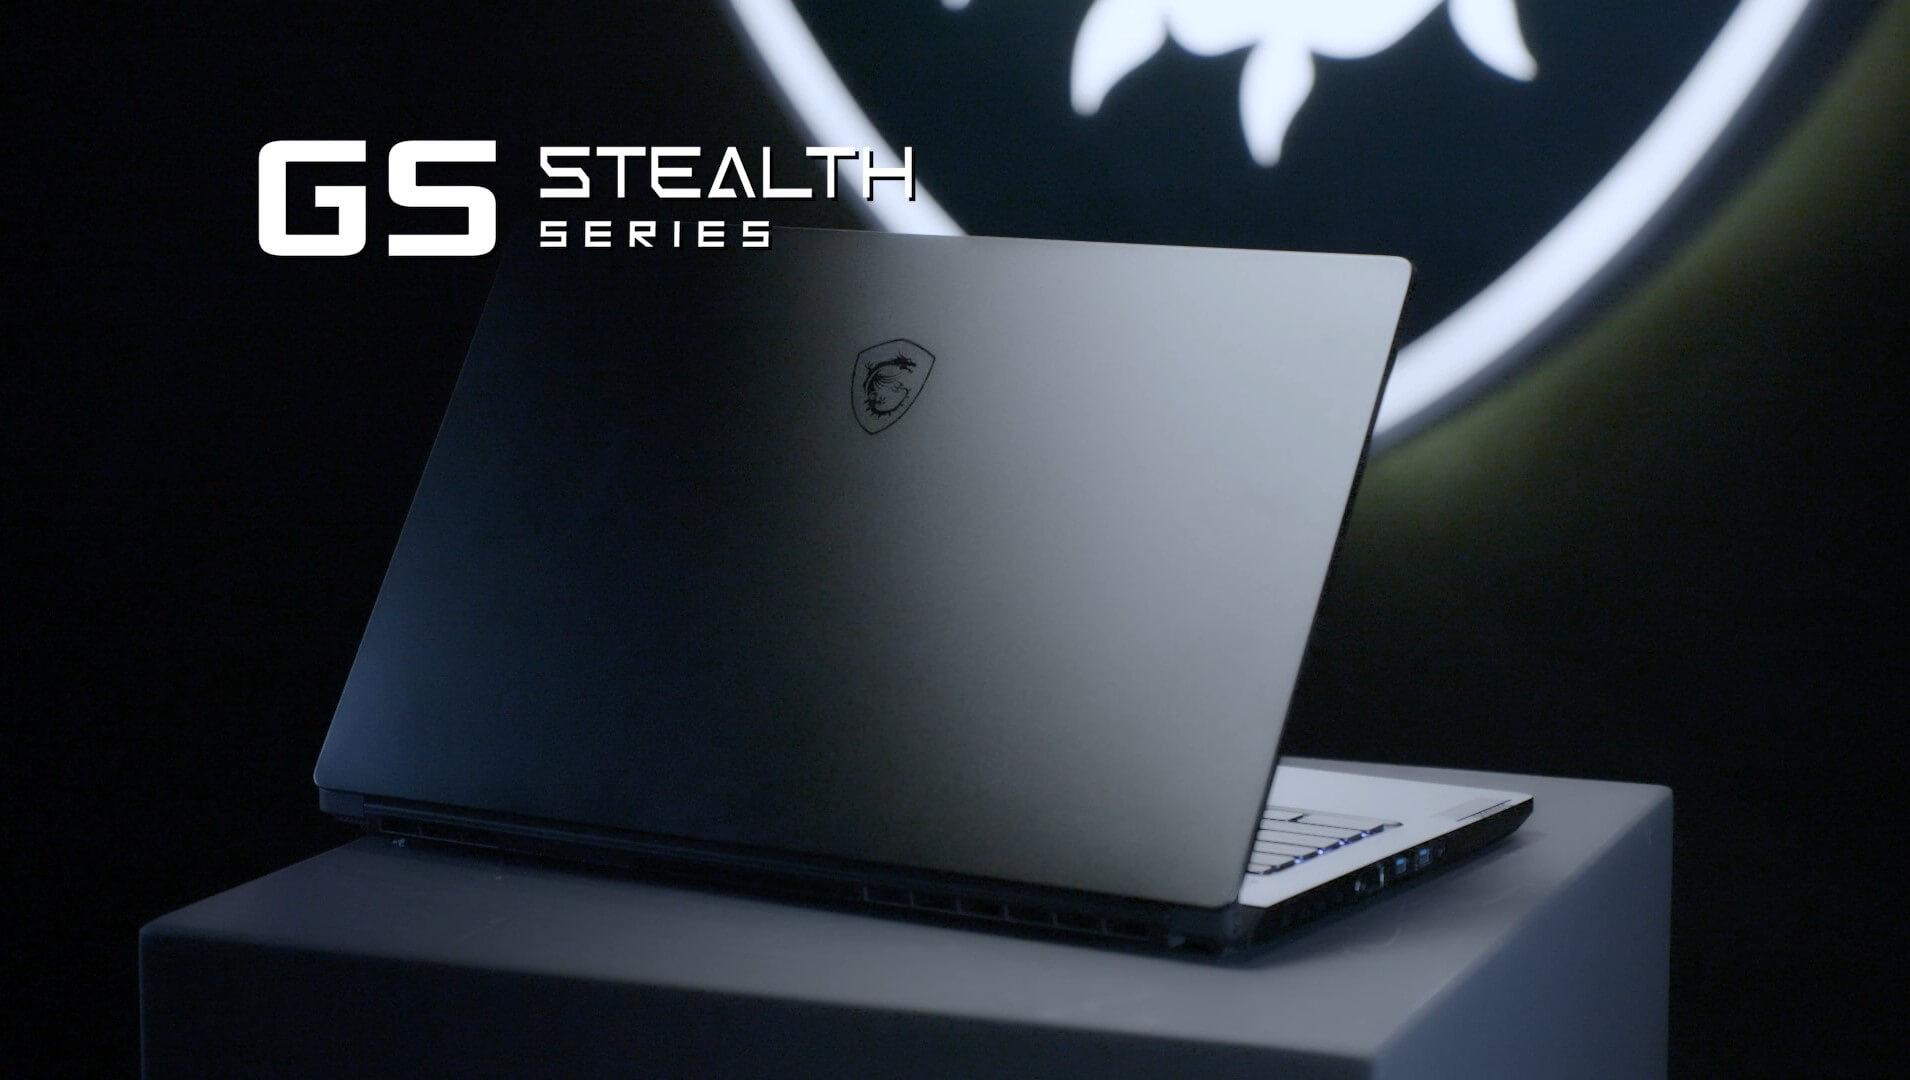 GS Stealth series